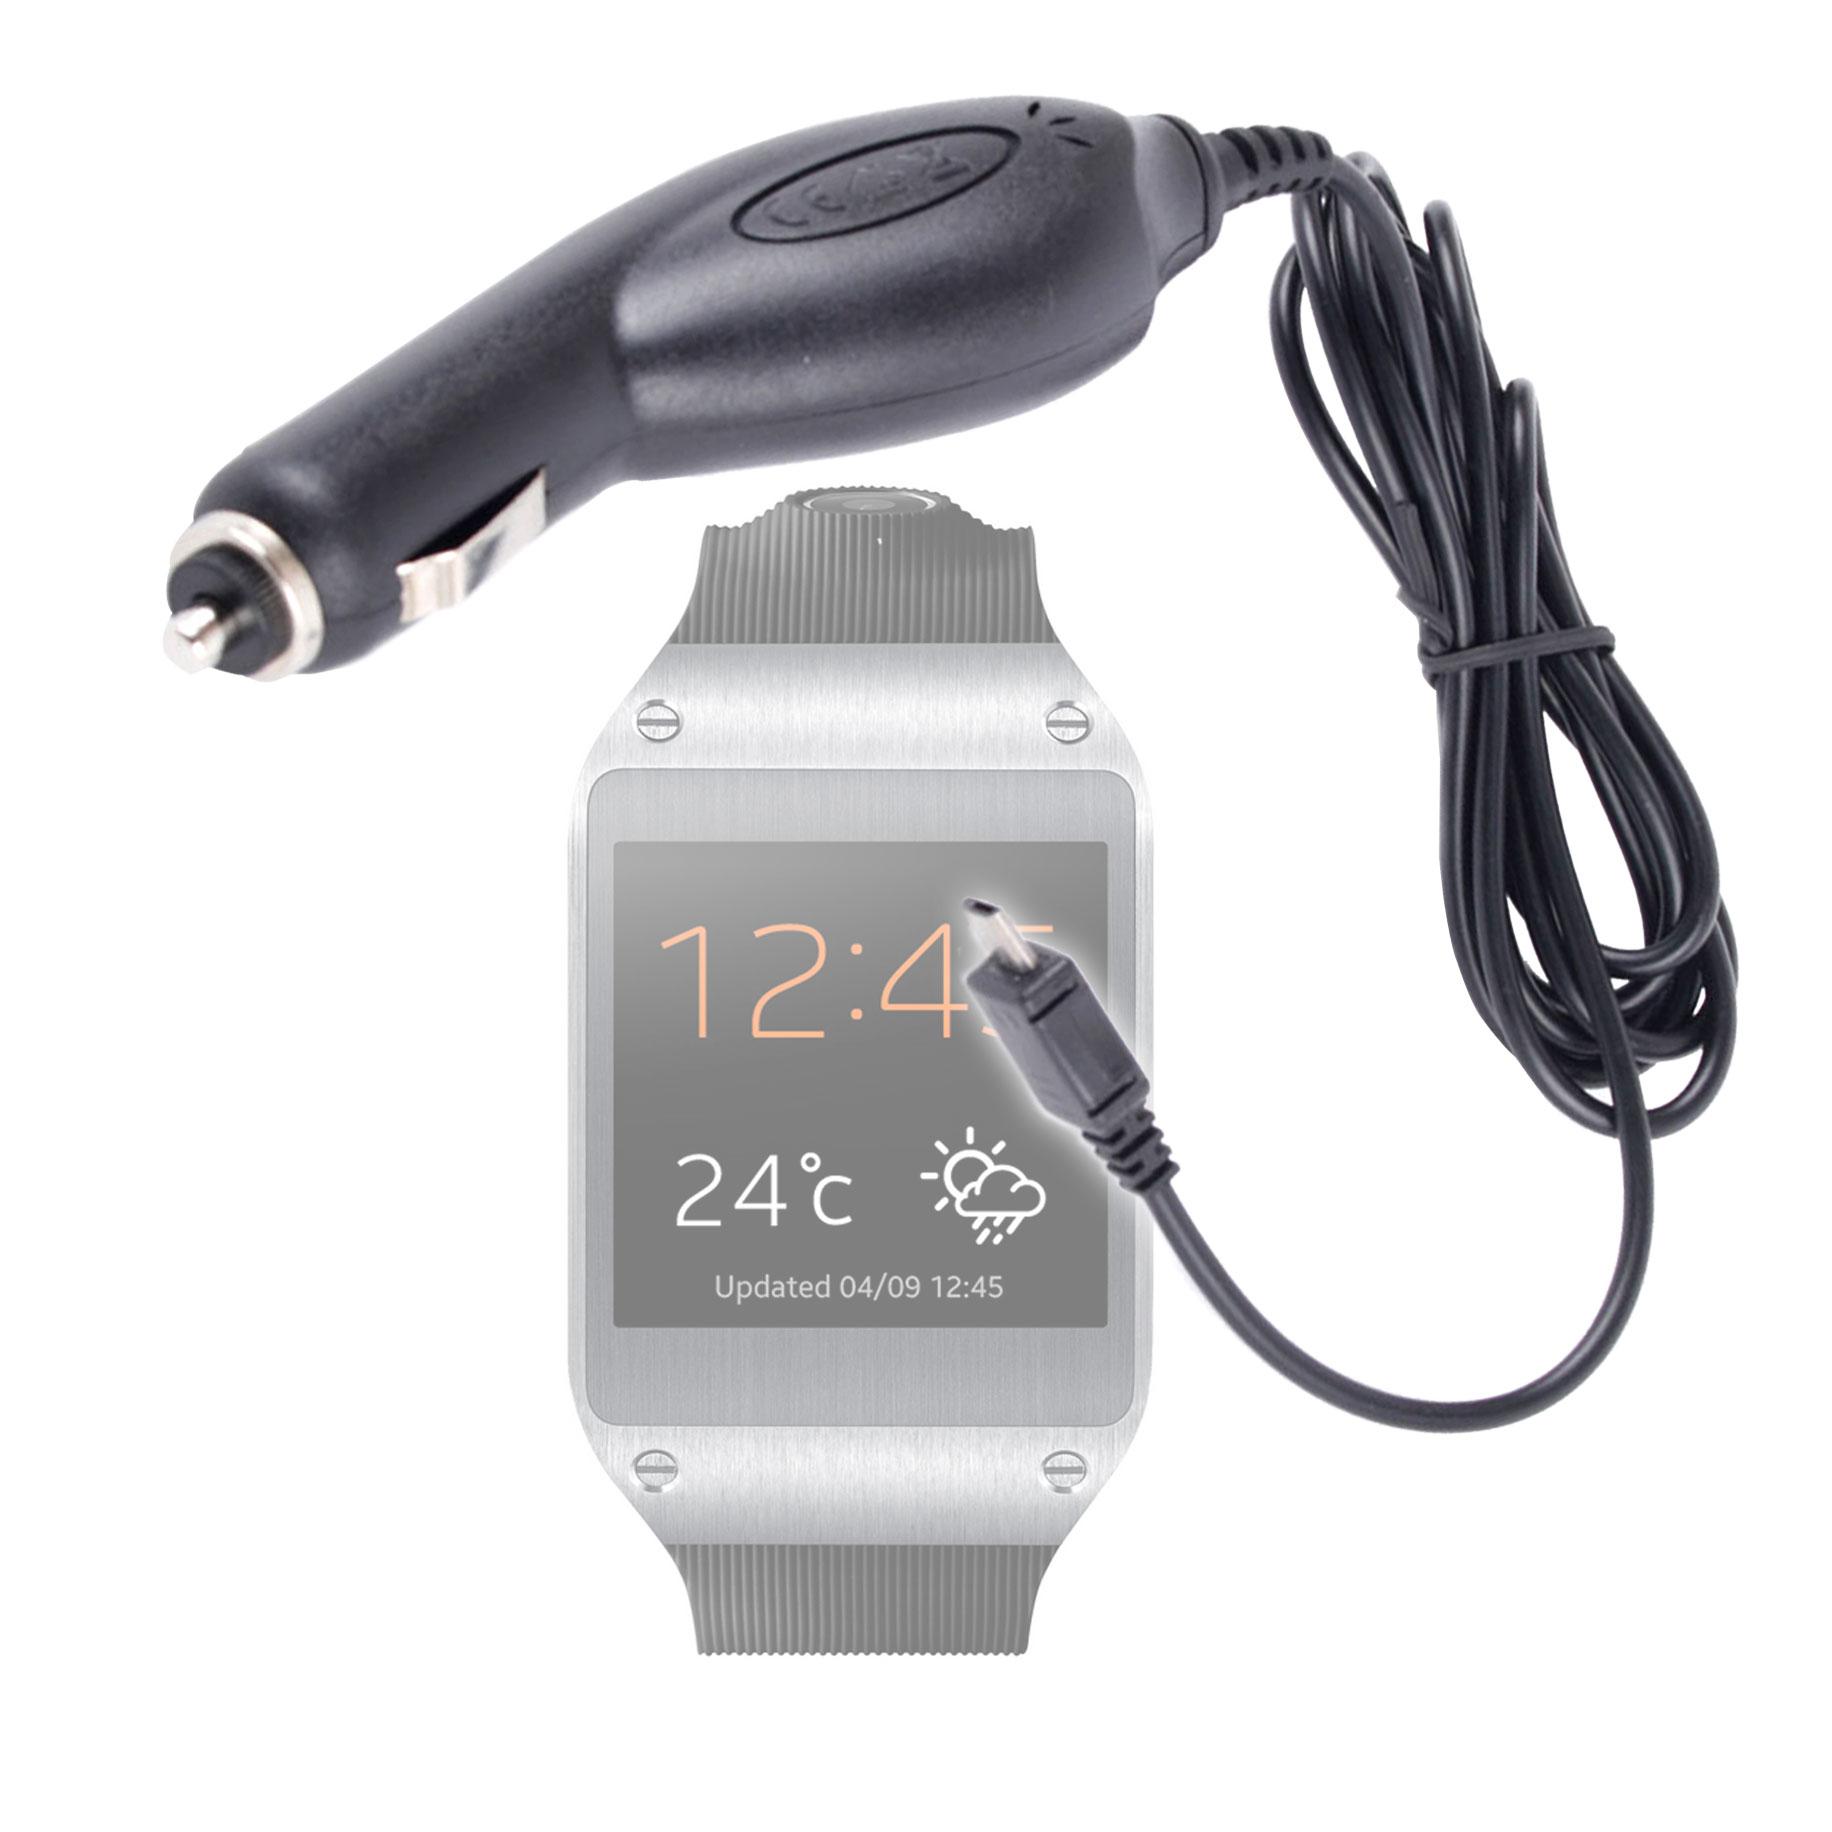 Chargeur voiture pour montre Samsung Galaxy Gear 2, Gear Neo ou light